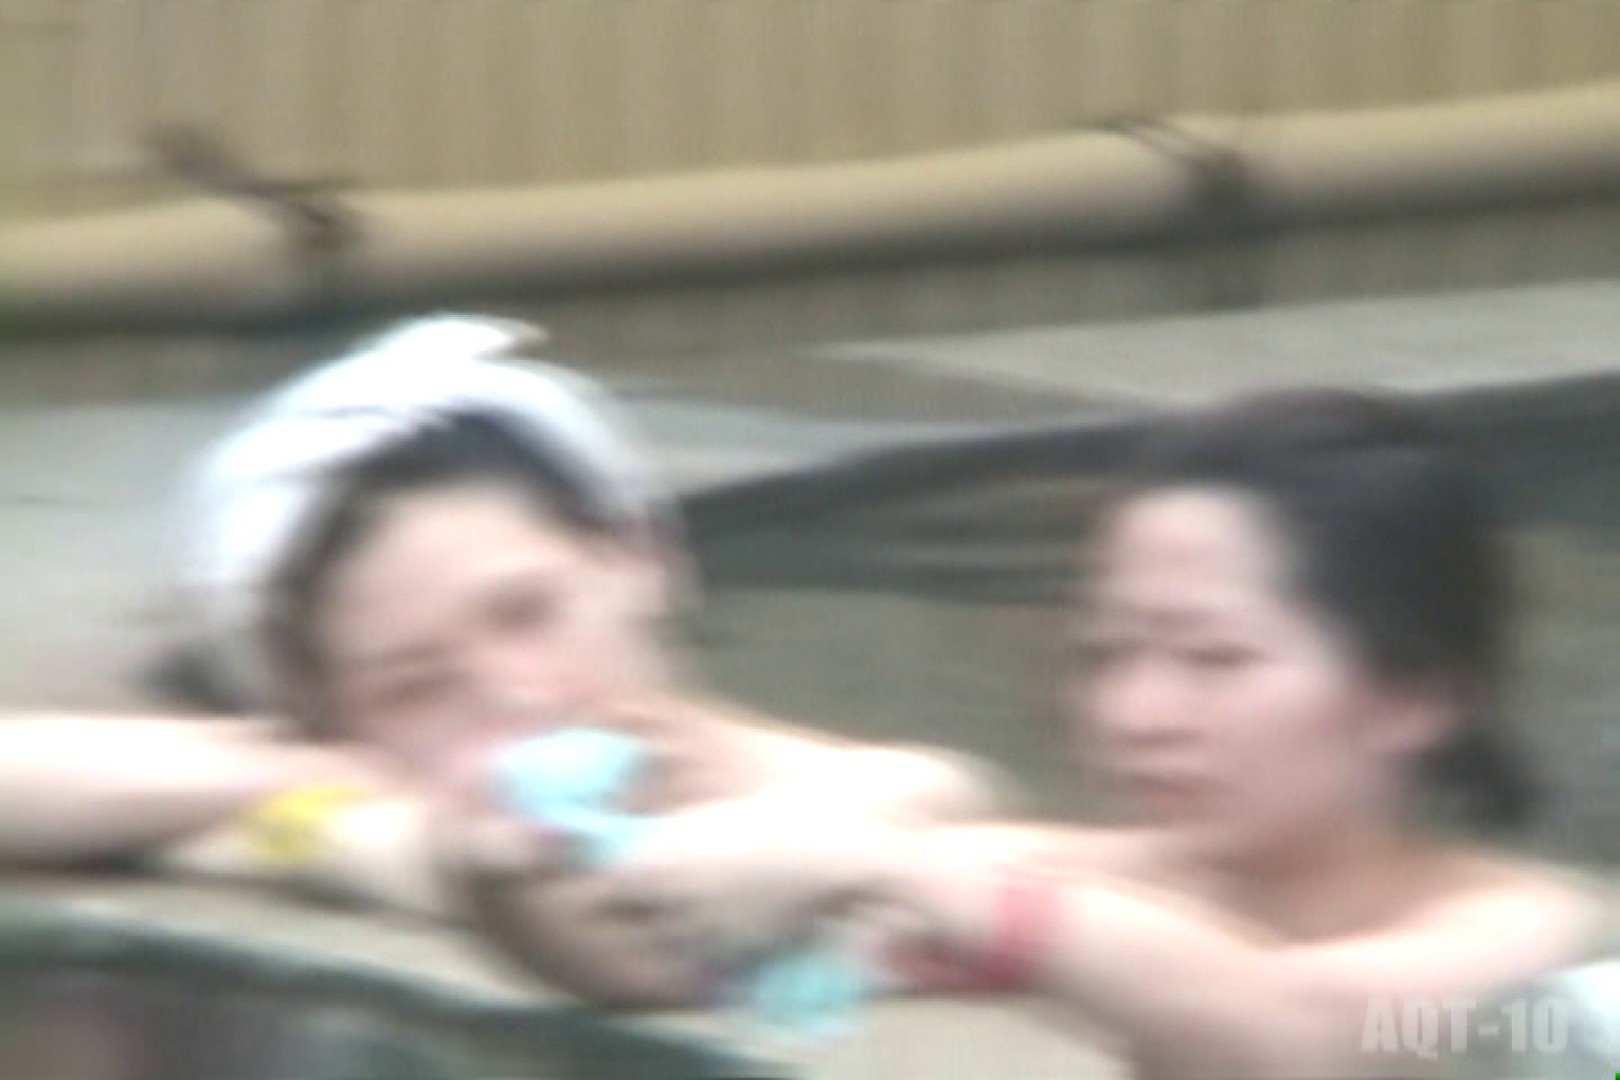 Aquaな露天風呂Vol.793 盗撮映像  72Pix 42